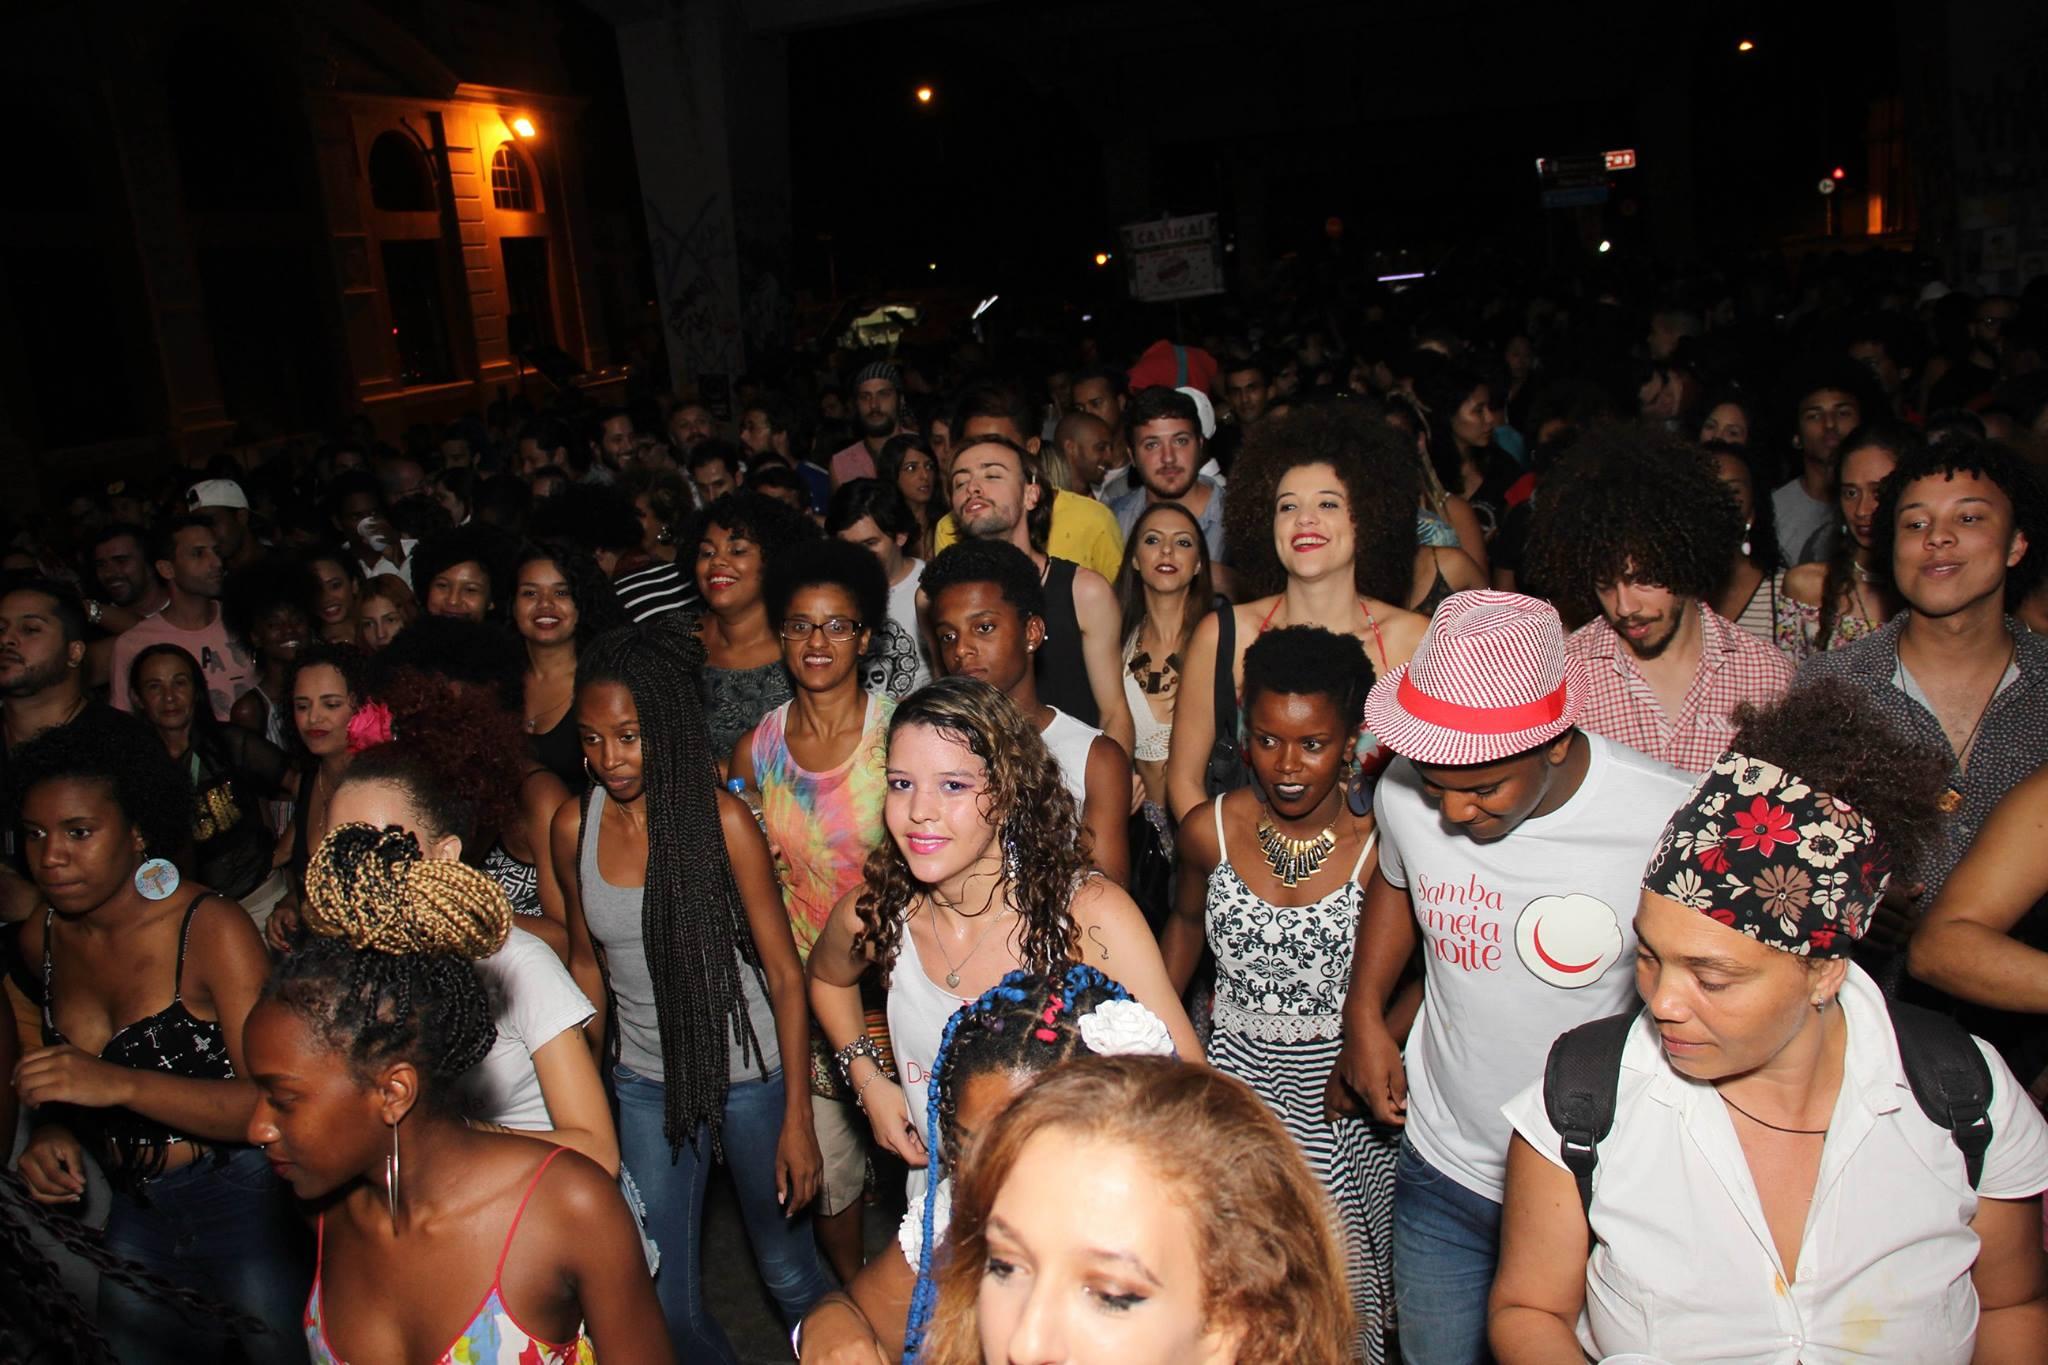 Samba da Meia Noite. A noite do malandro, 08/04/2016